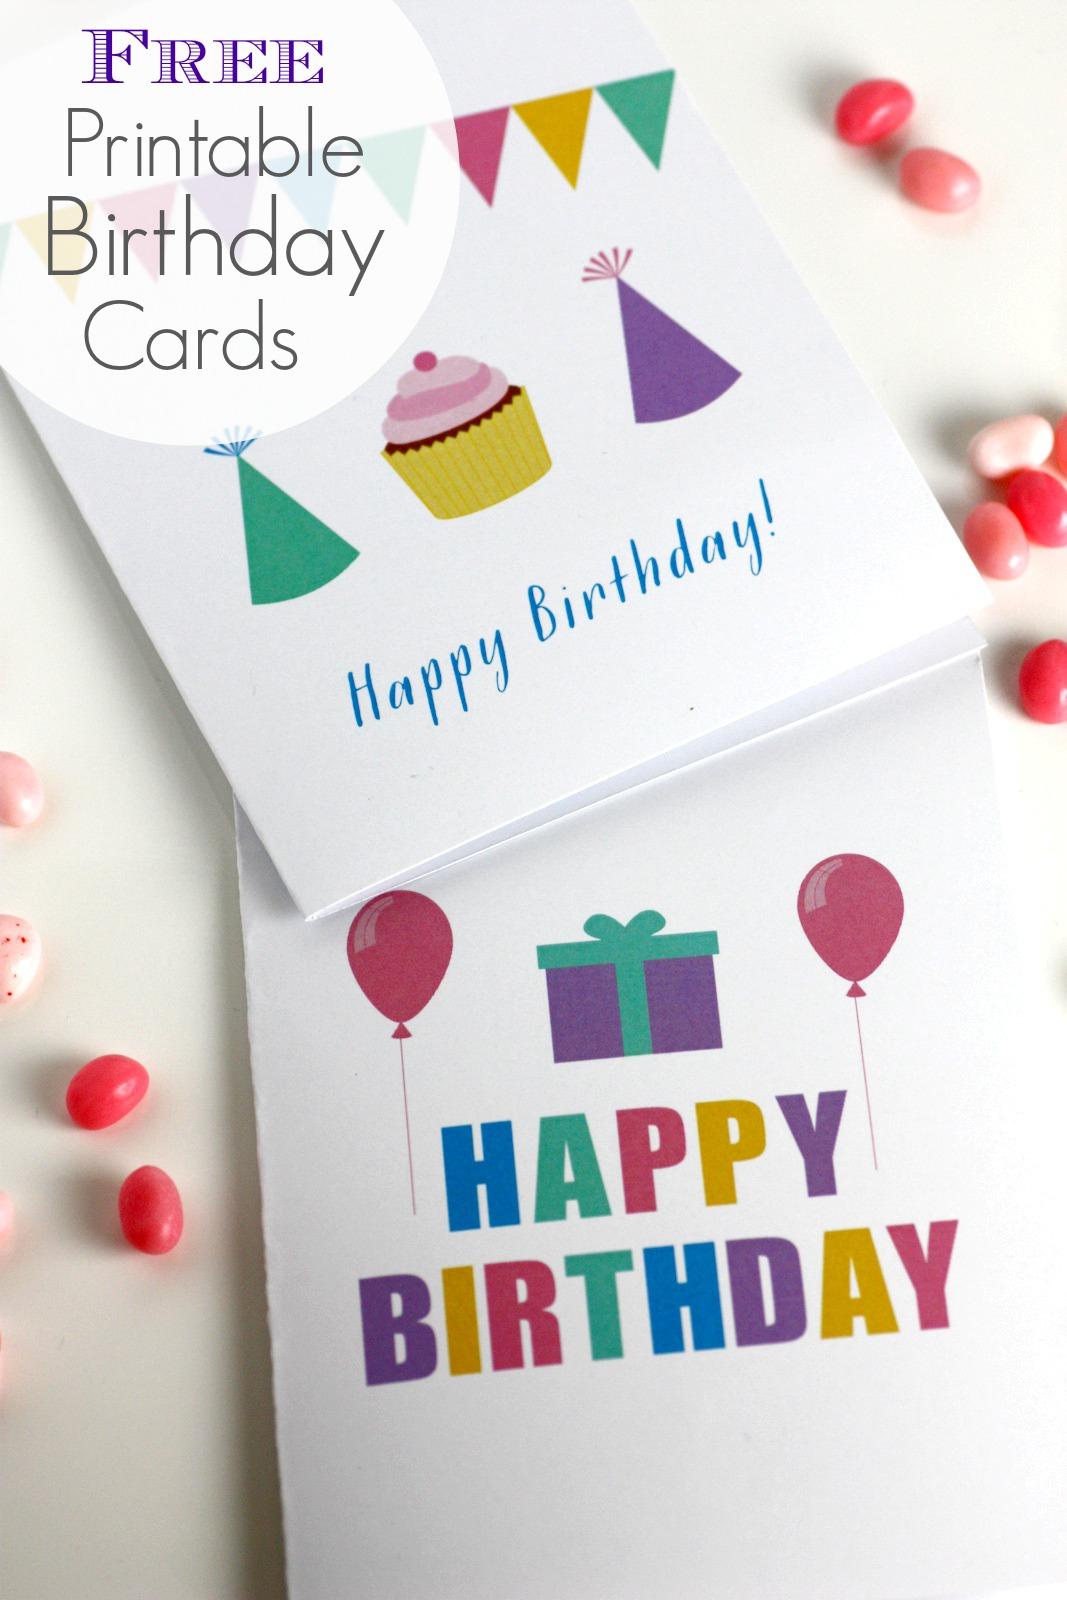 Free Printable Blank Birthday Cards | Catch My Party - Free Printable Birthday Cards